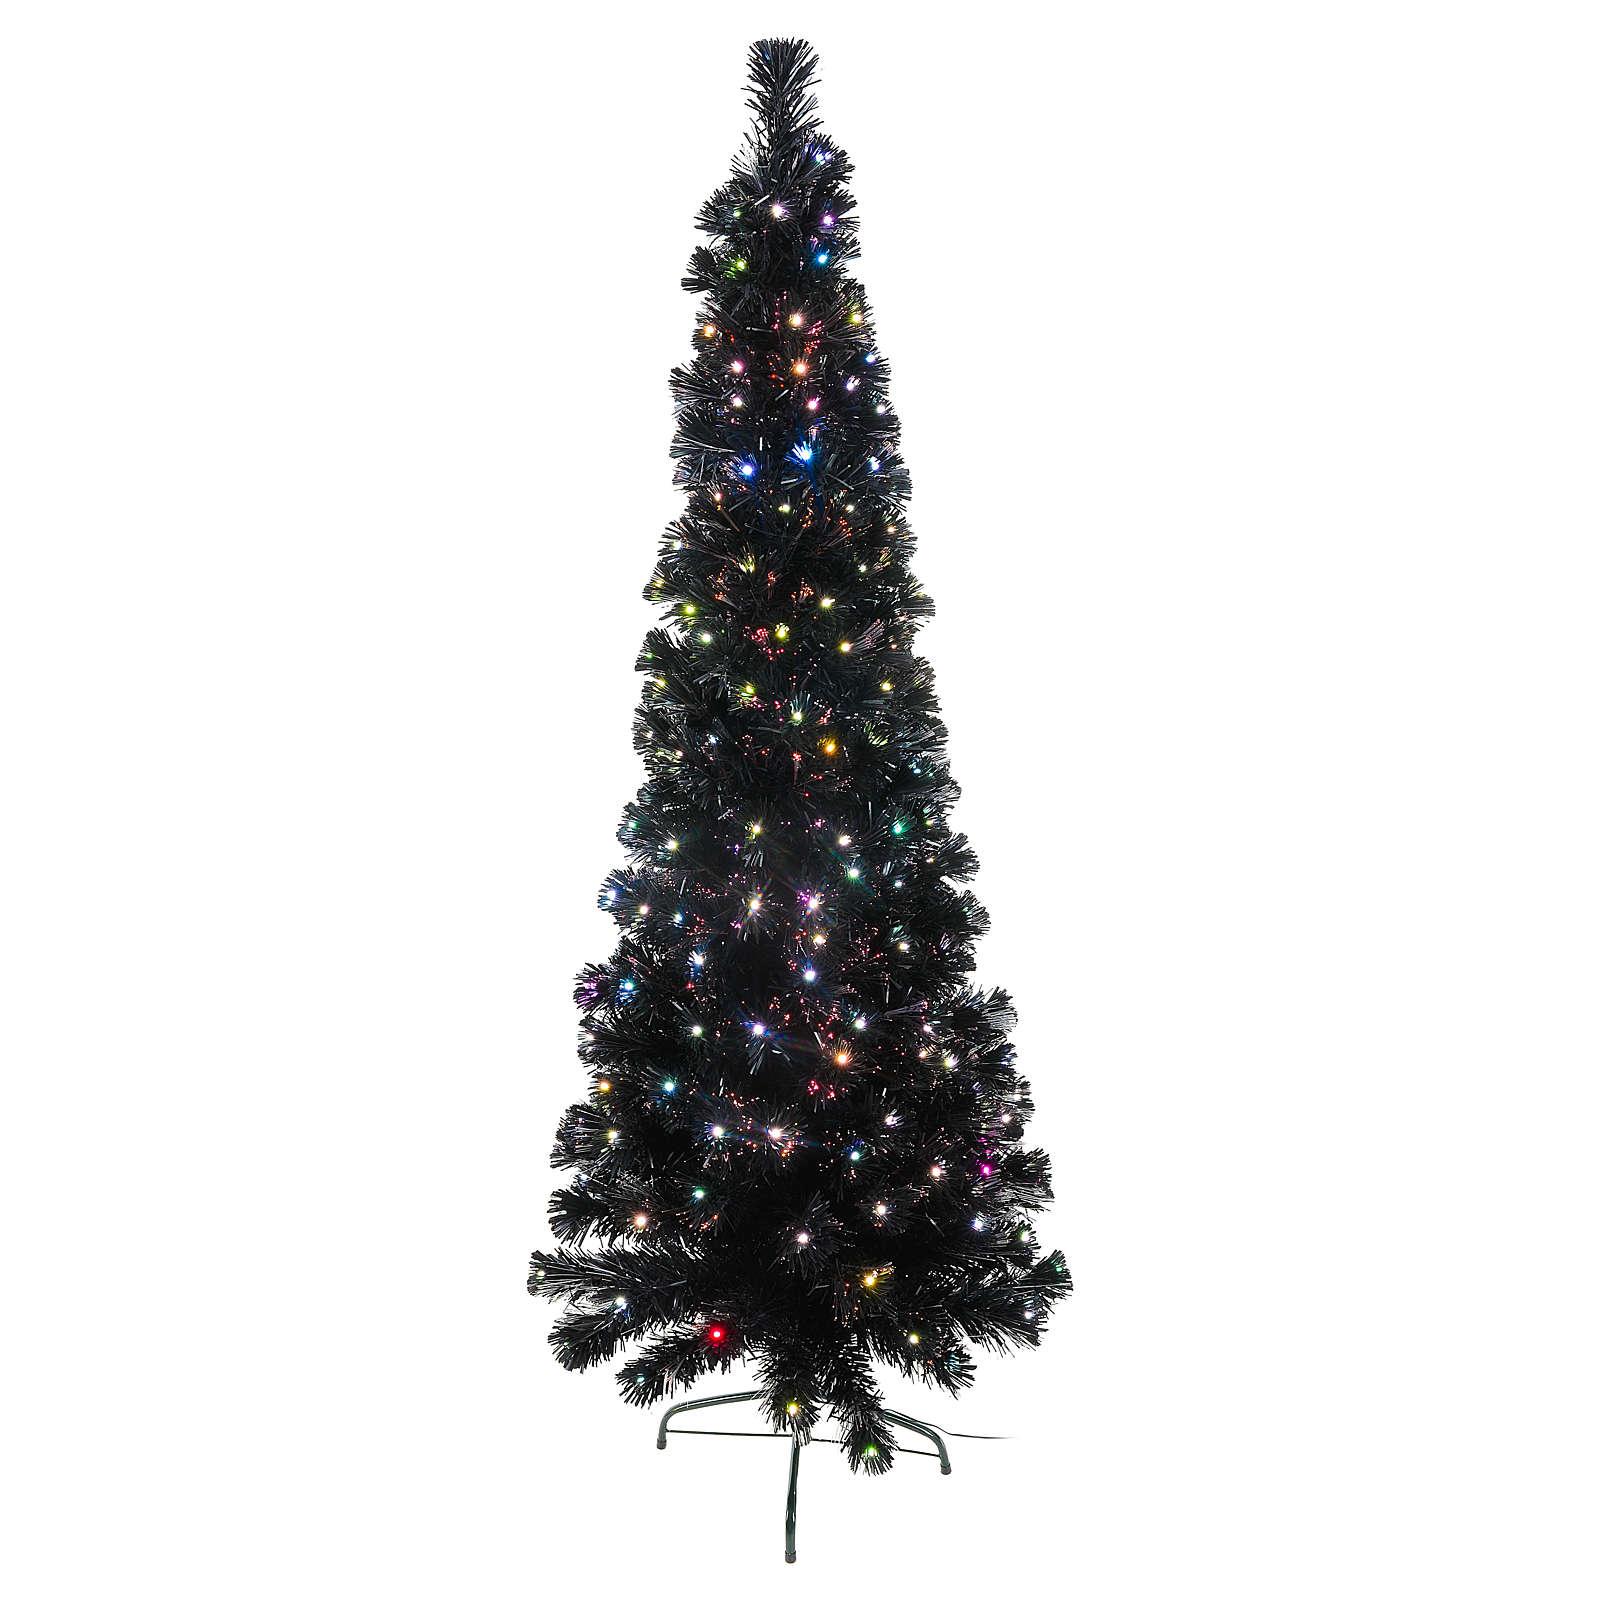 Weihnachstbaum 180cm slim Mod. Black Shade multicolor Leds 3